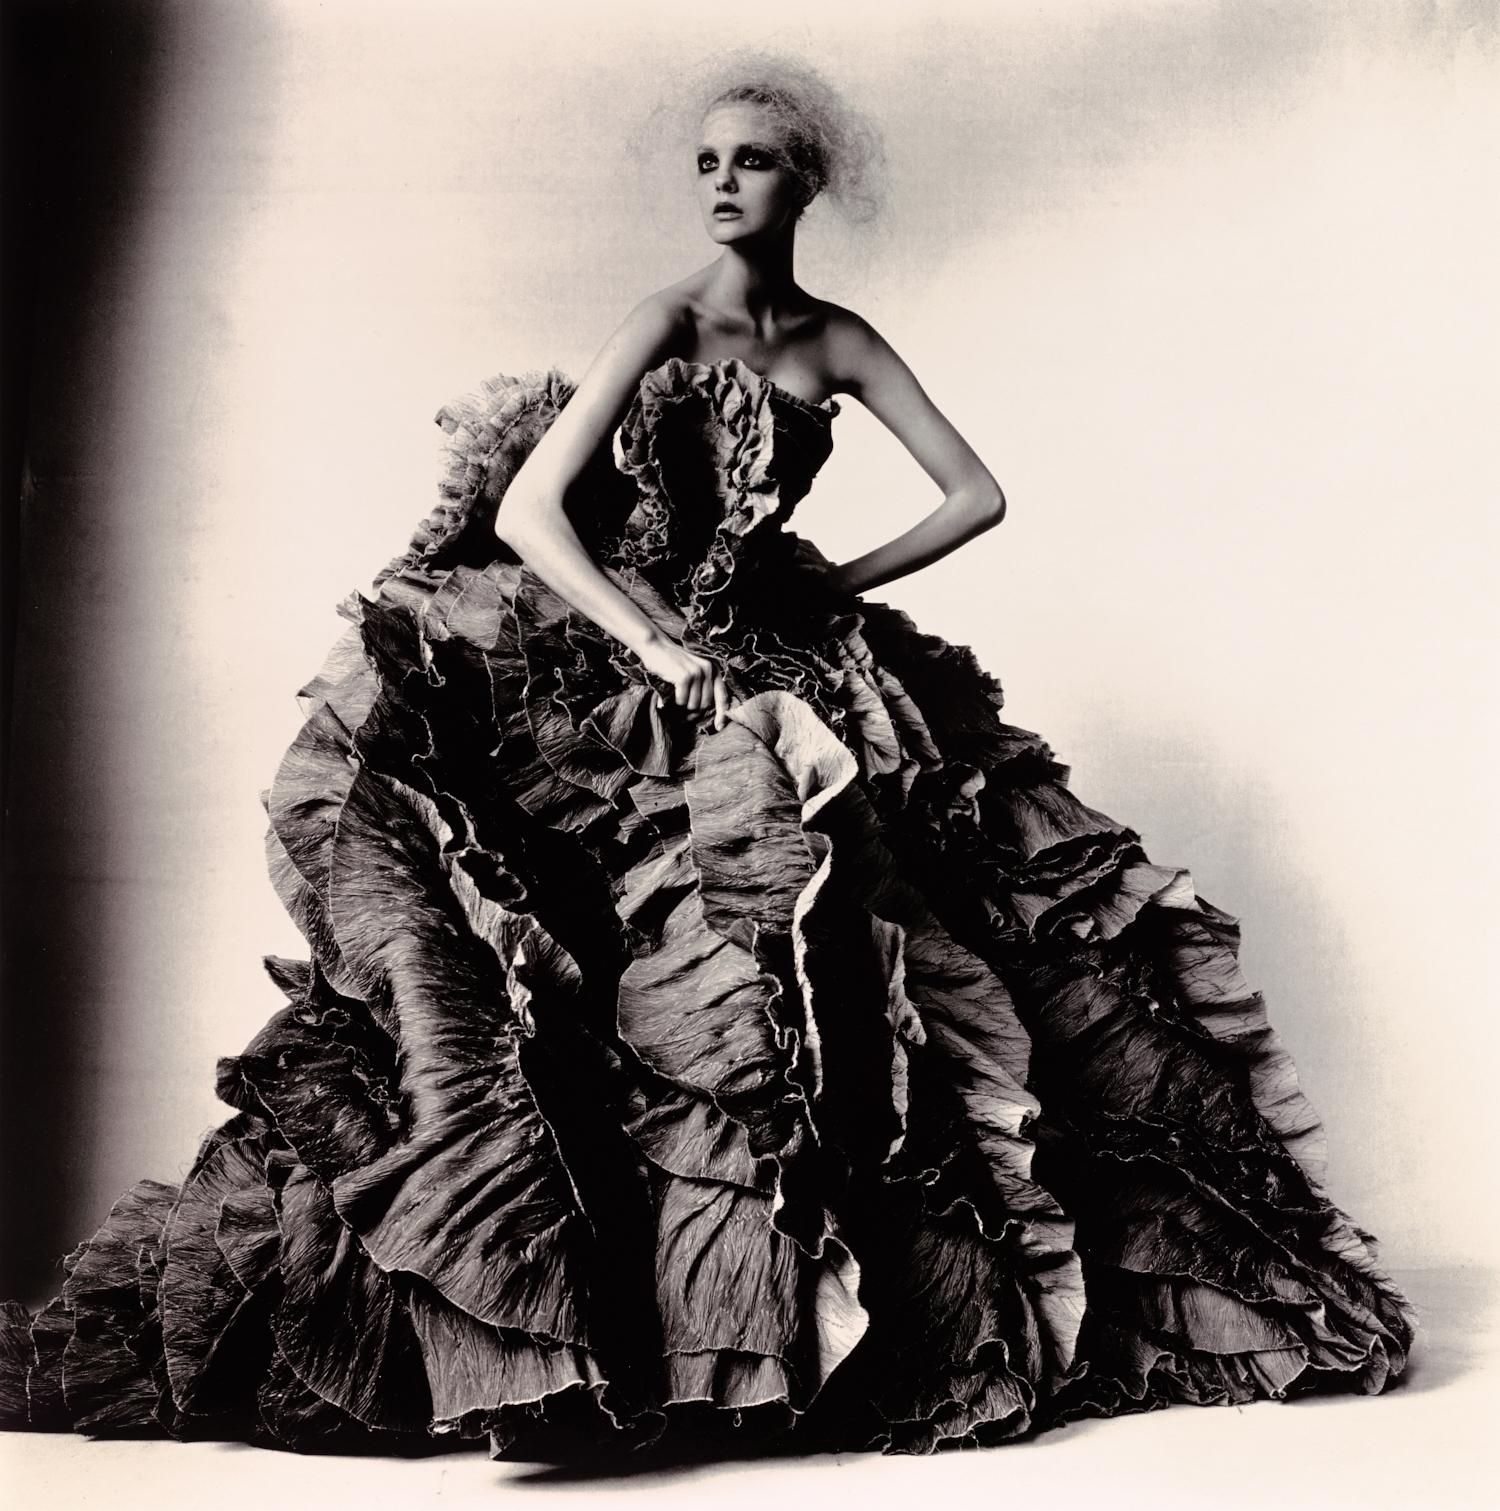 Ball Dress by Olivier Theyskens for Nina Ricci , New York, 2007 Gelatin silver print © Condé Nast